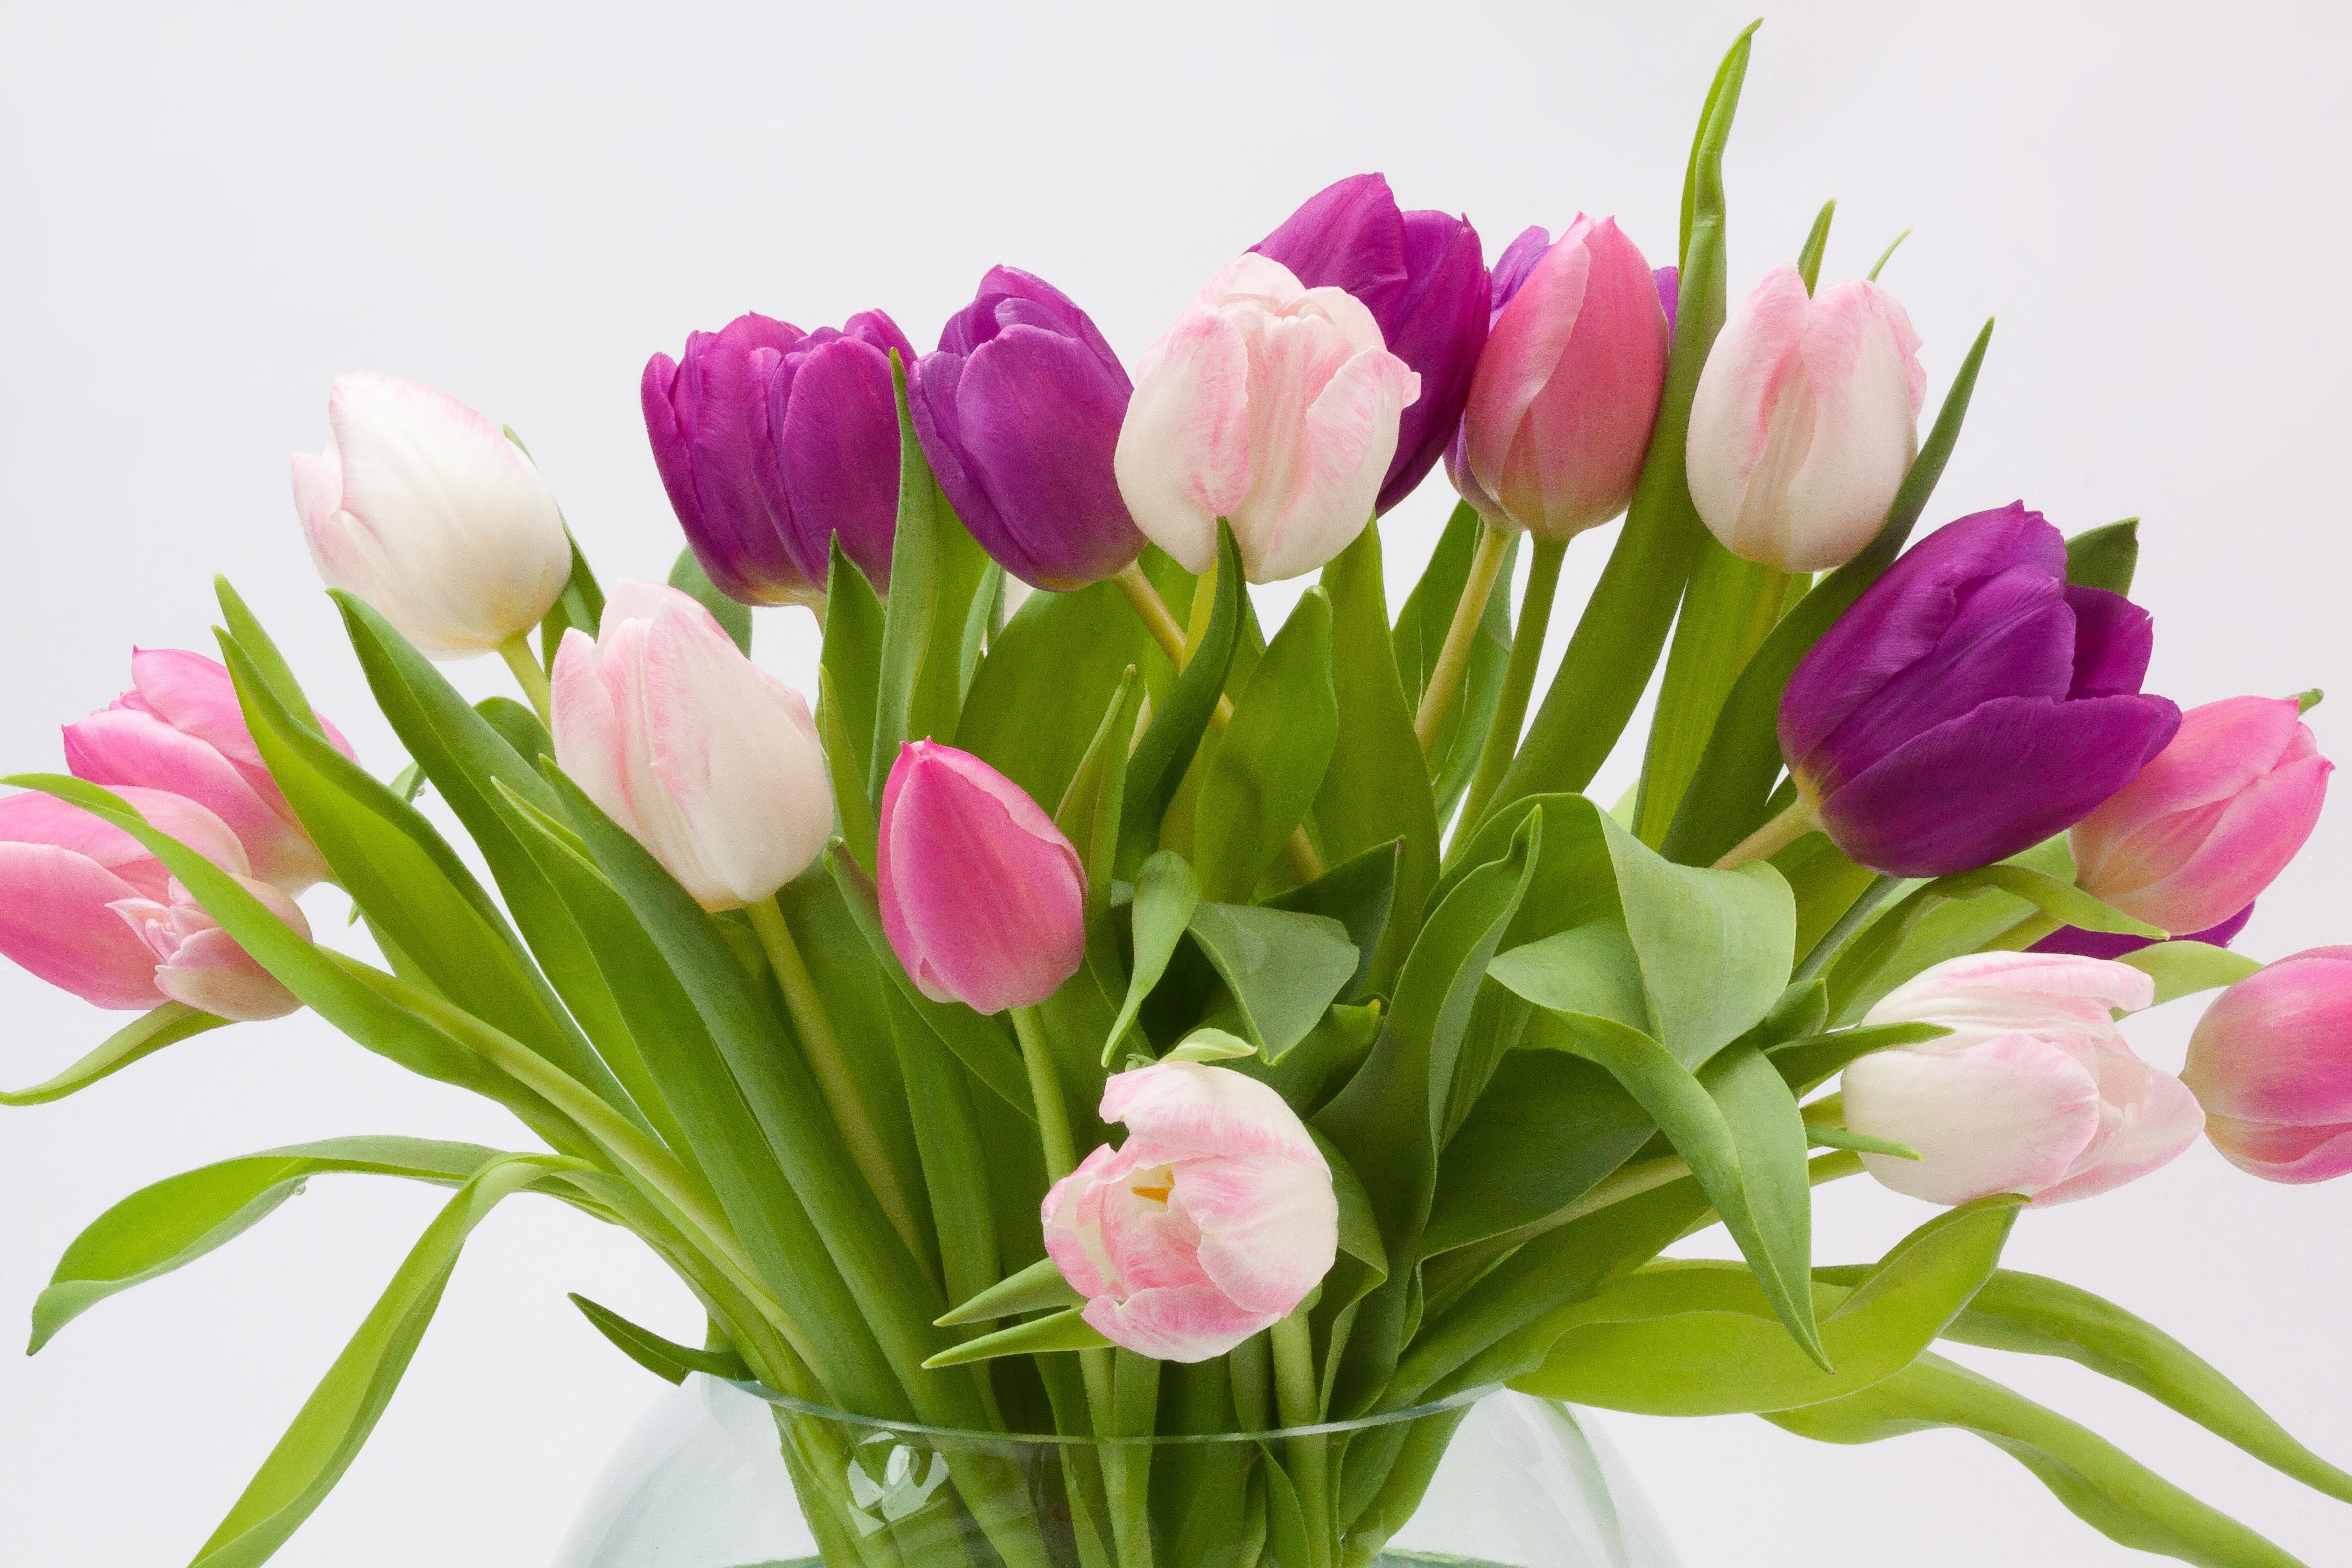 free images blossom leaf petal bloom tulip green red pink